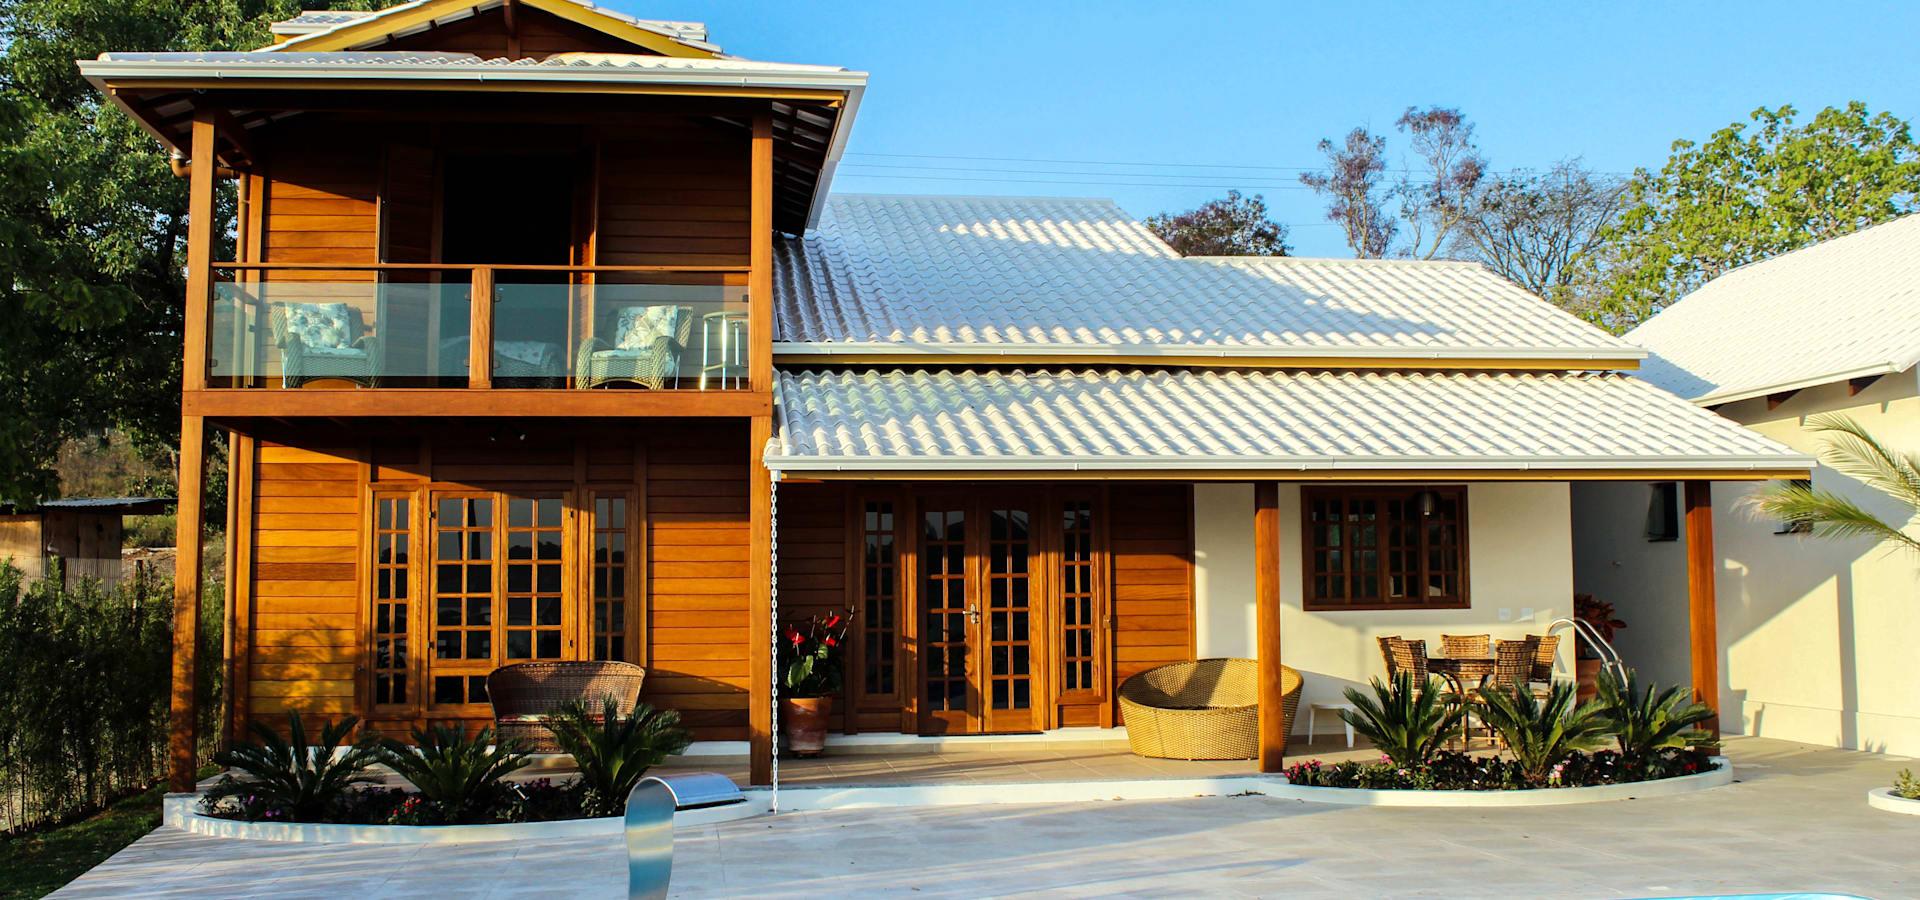 casas pré-fabricadas - Entenda Antes